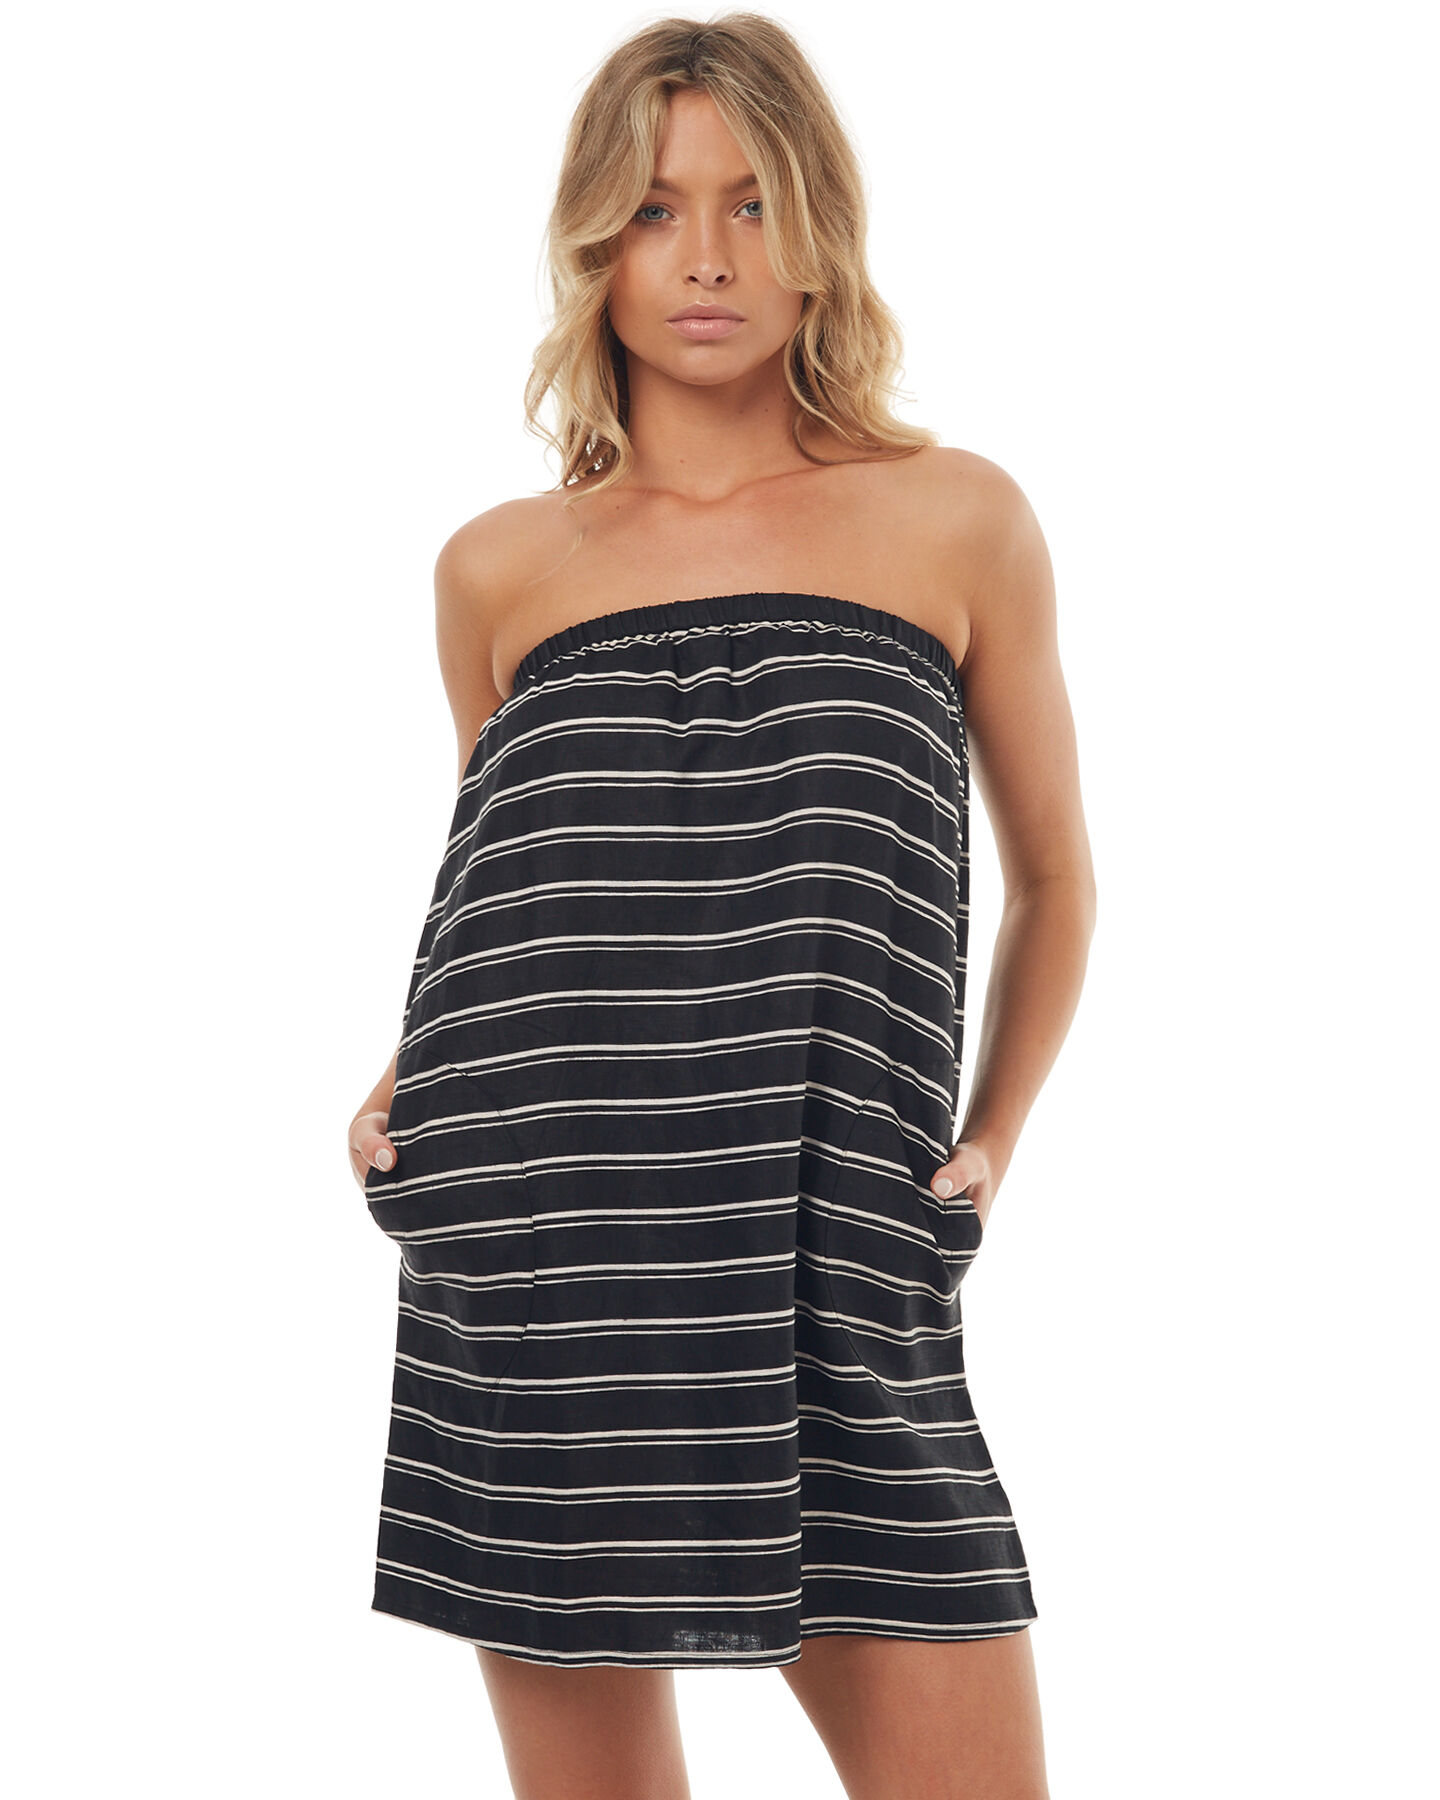 Zephyr Gloria Womens Strapless Dress